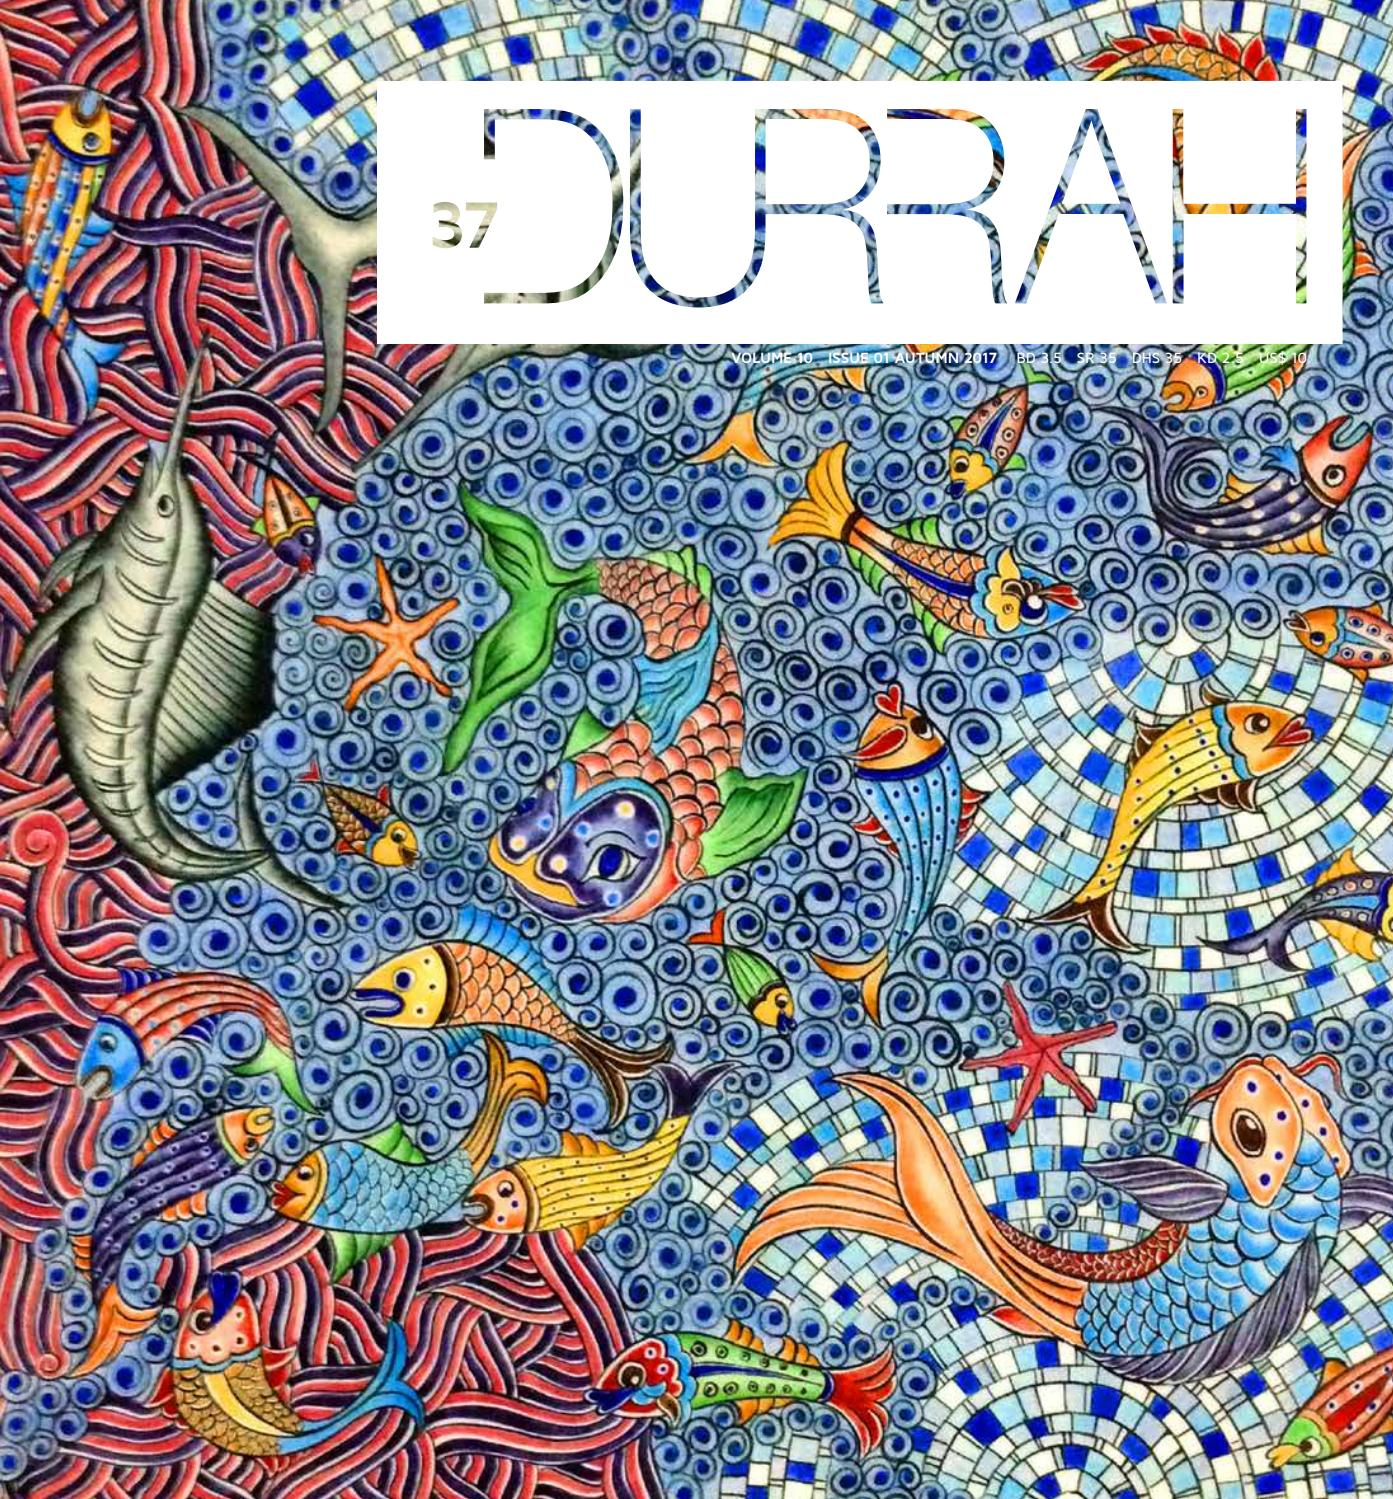 0a38740139f Durrah issue 37 by Durrah Luxury - issuu